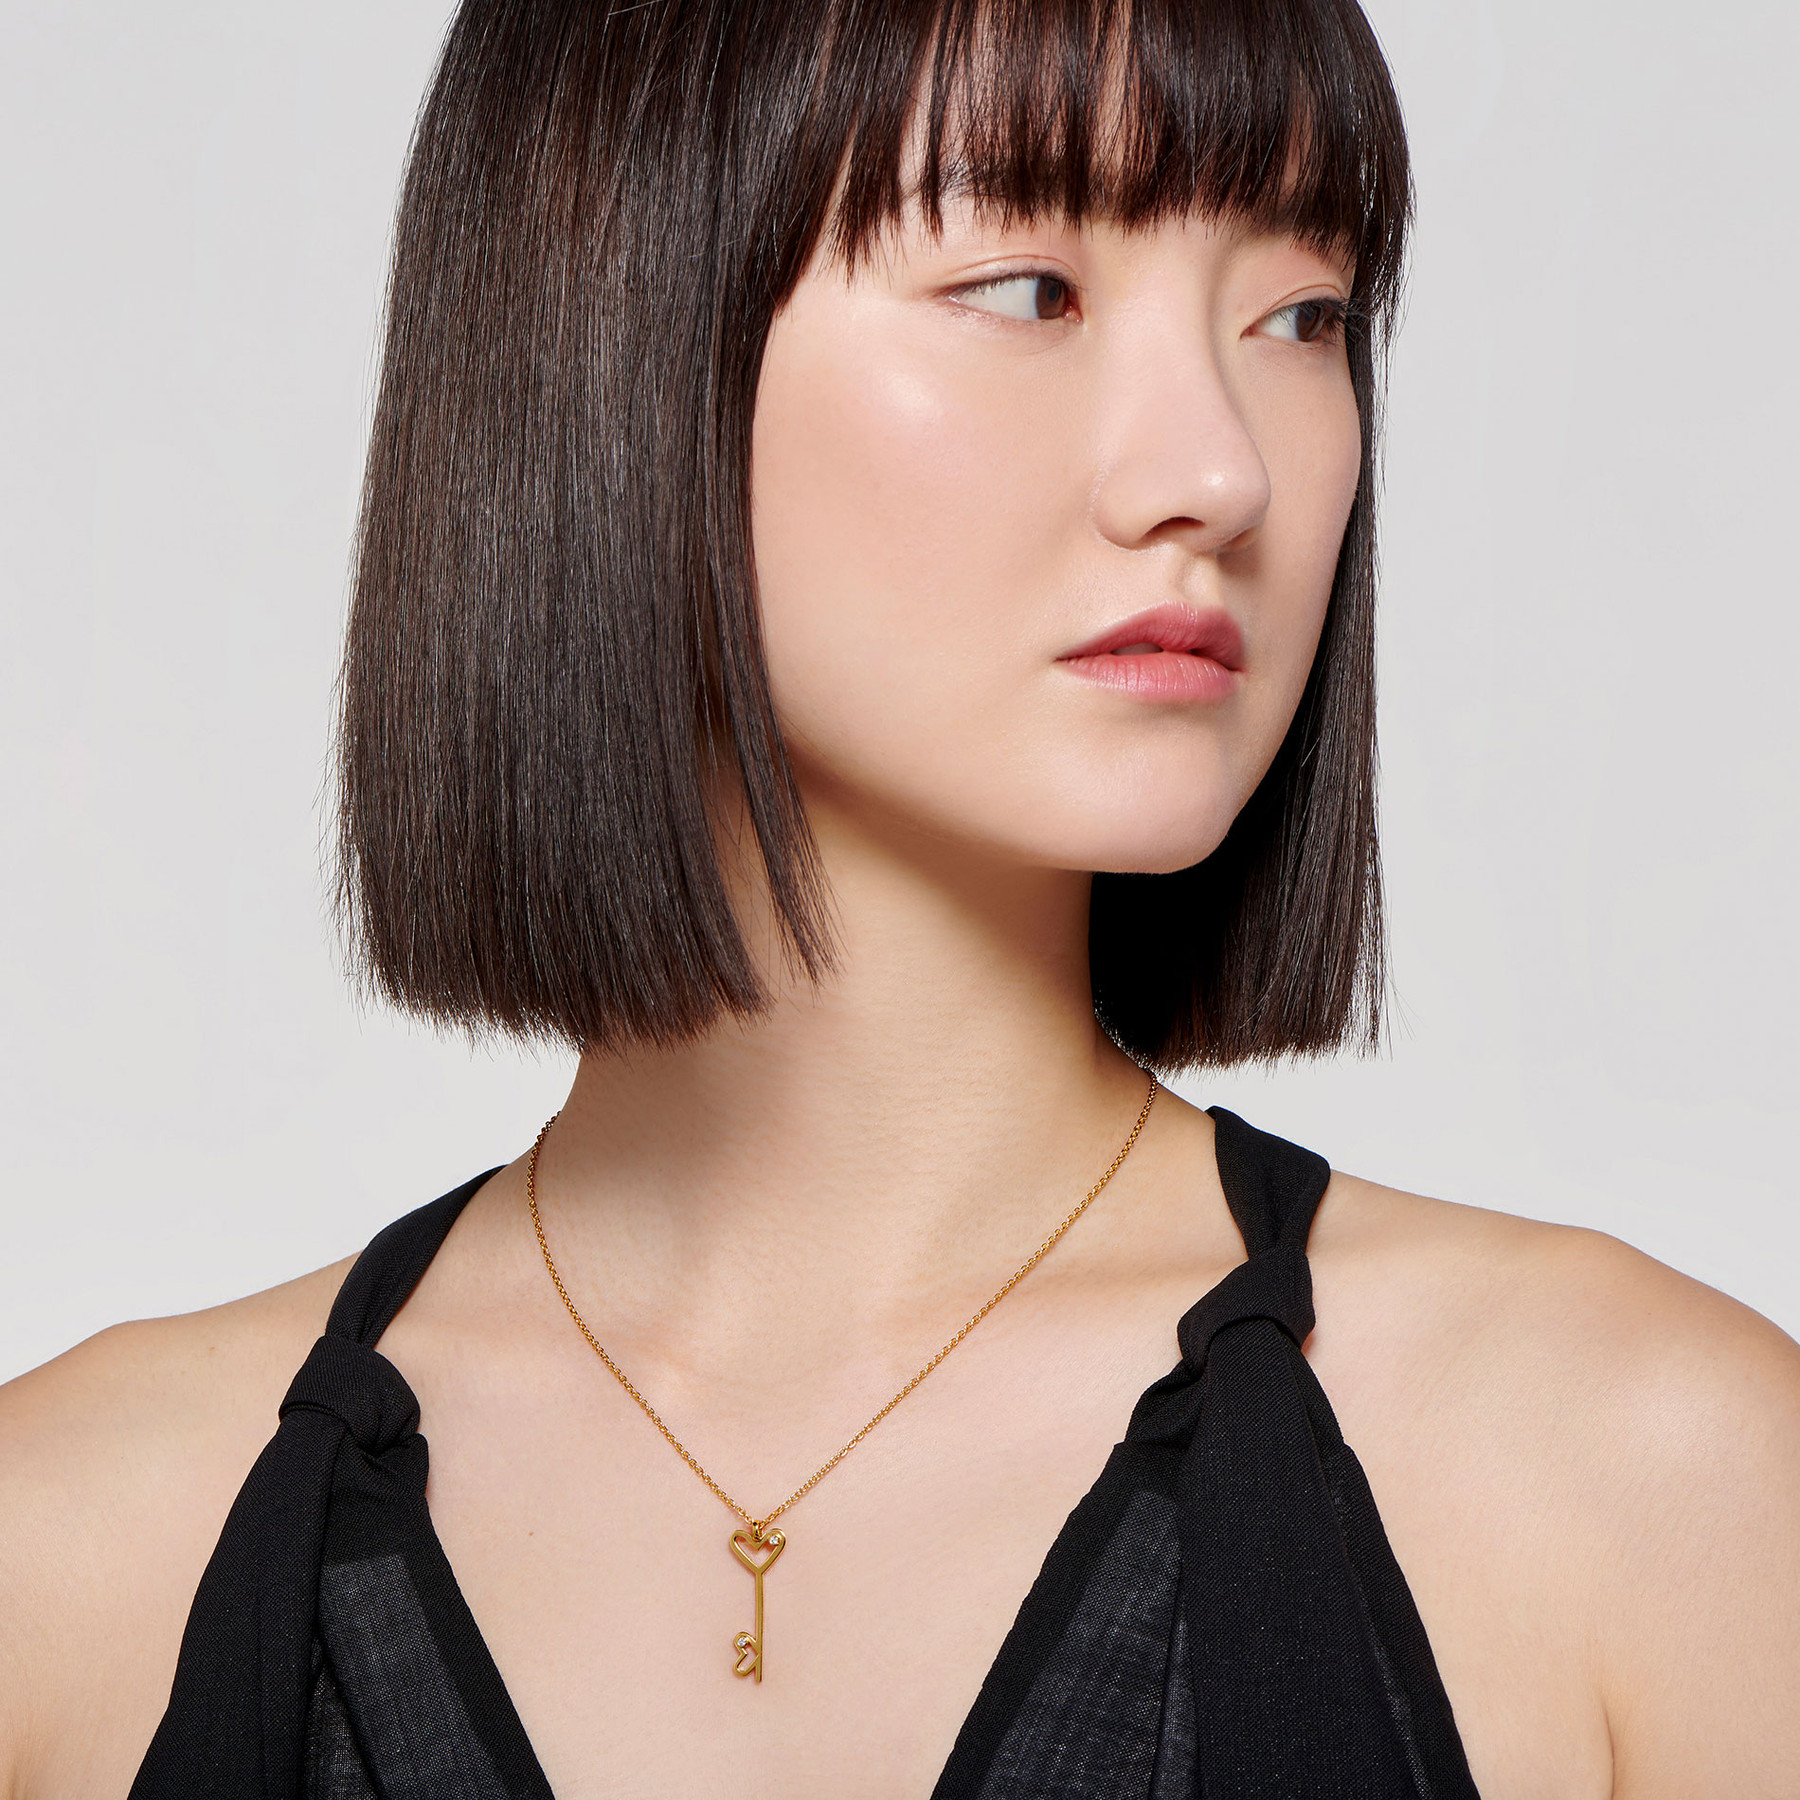 elegant East Asian model wearing 22 karat gold necklace with double key pendant